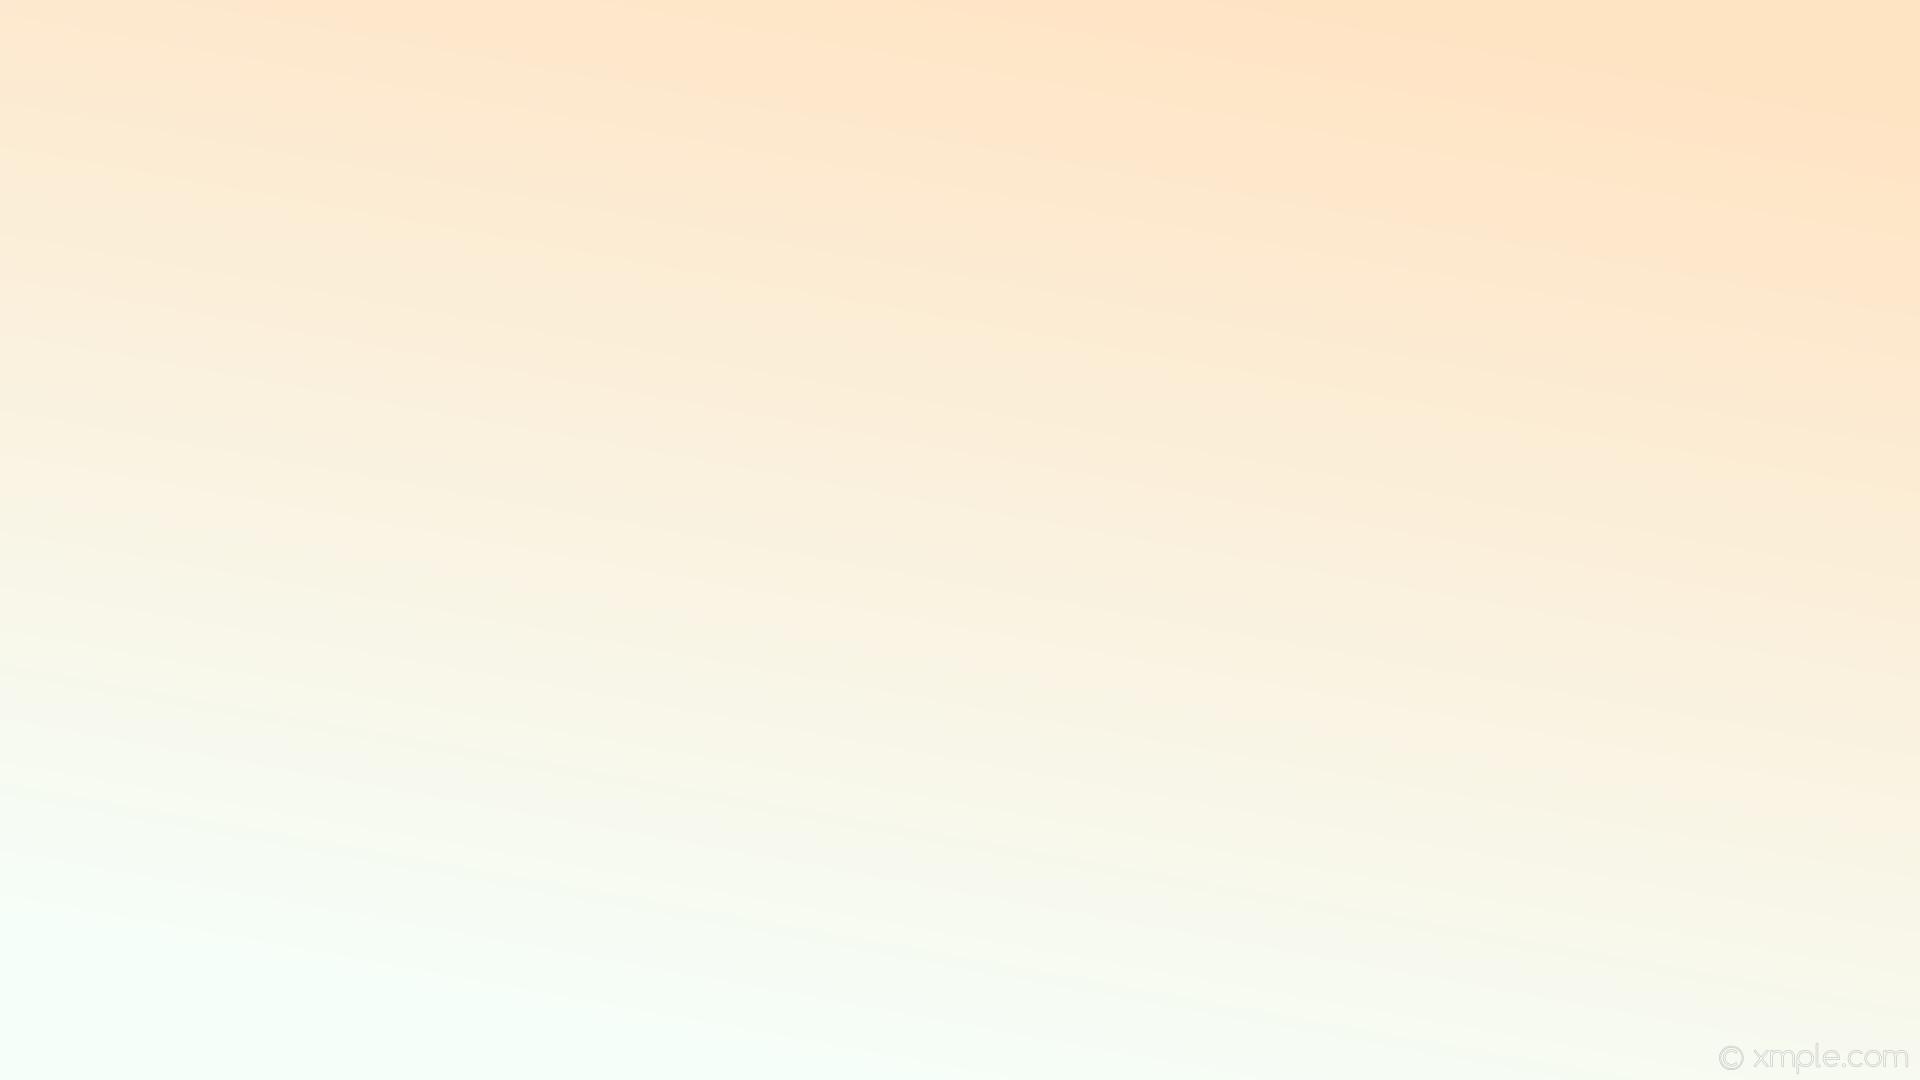 Res: 1920x1080, wallpaper gradient linear white brown bisque mint cream #ffe4c4 #f5fffa 60°